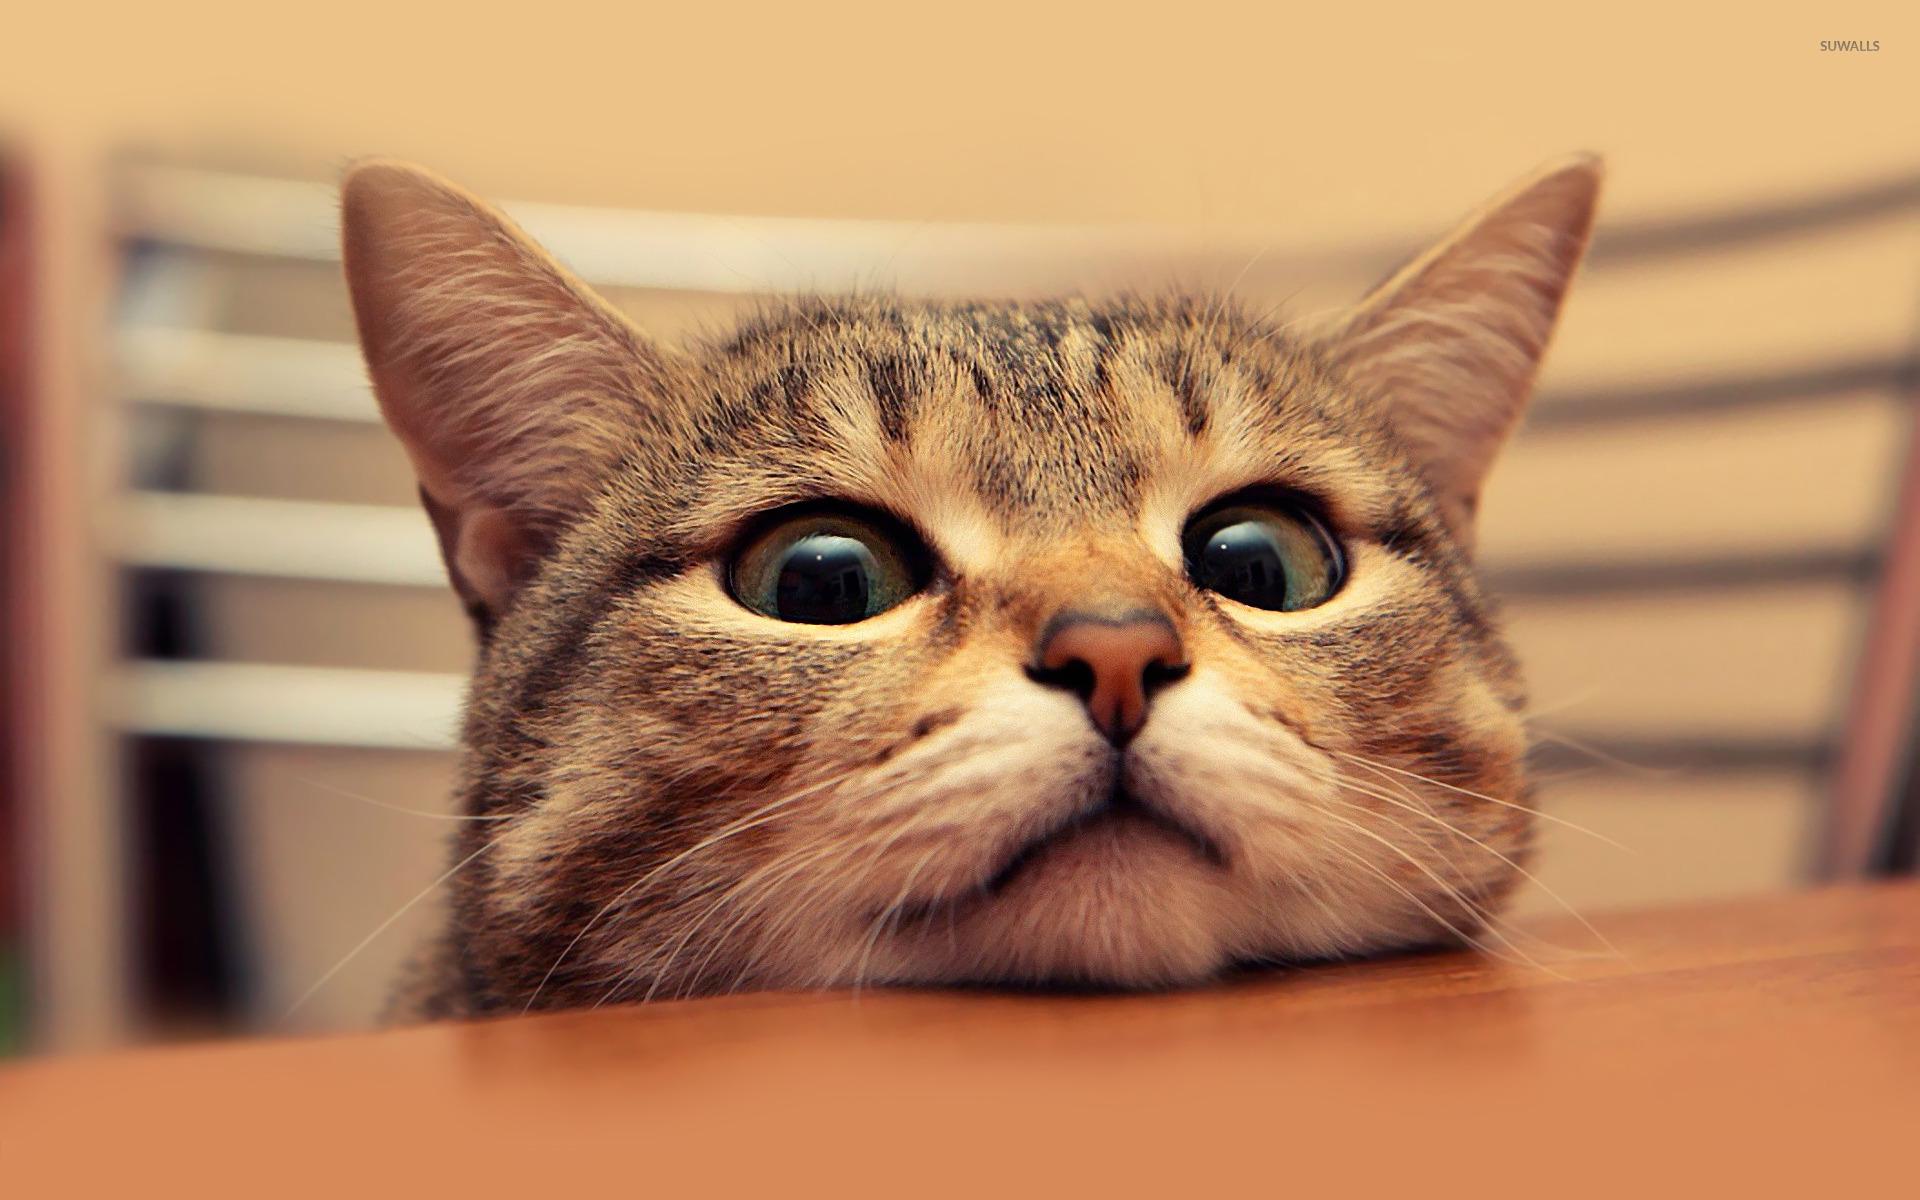 Wonderful Cat Wallpaper 1920x1200 - cat-15307-1920x1200  Image_1002953 .jpg